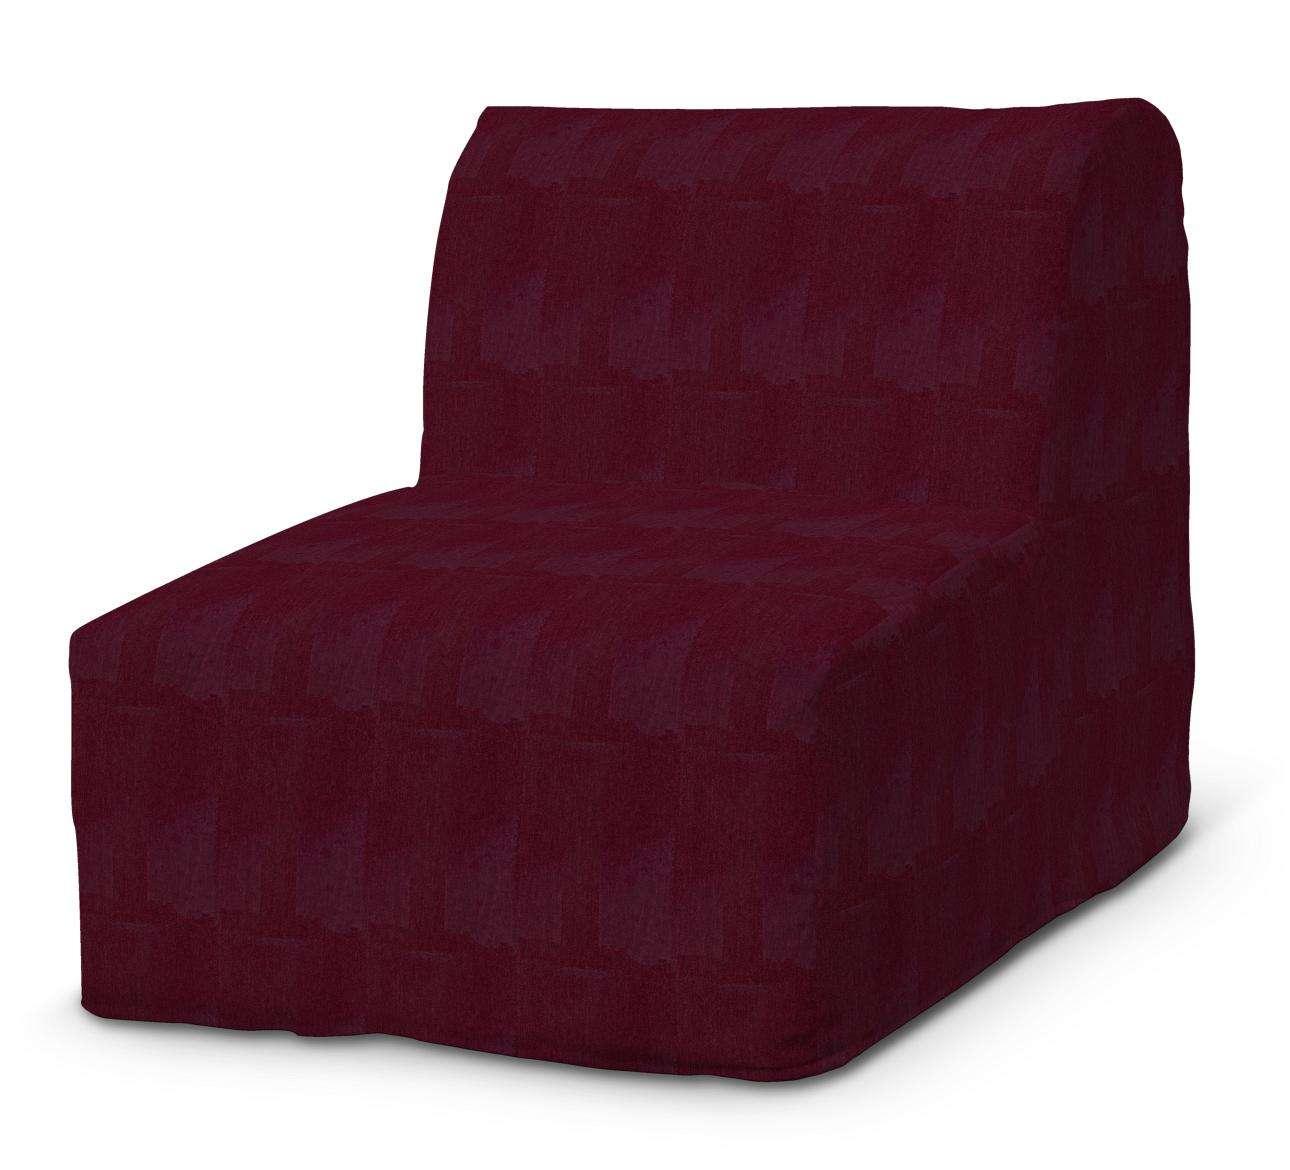 Lycksele Sesselbezug fotel Lycksele von der Kollektion Chenille , Stoff: 702-19